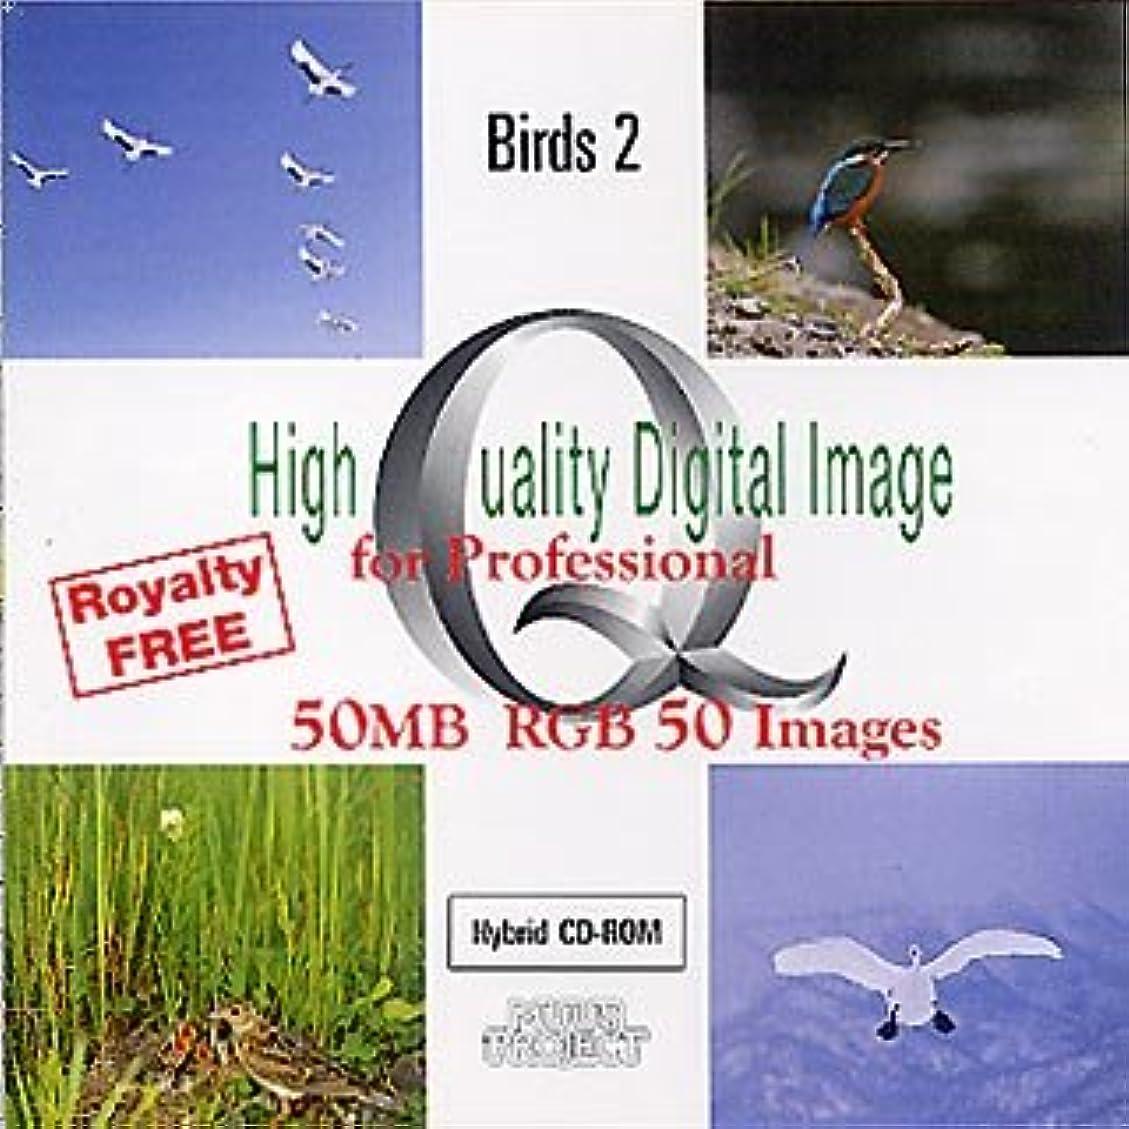 High Quality Digital Image for Professional Birds 2